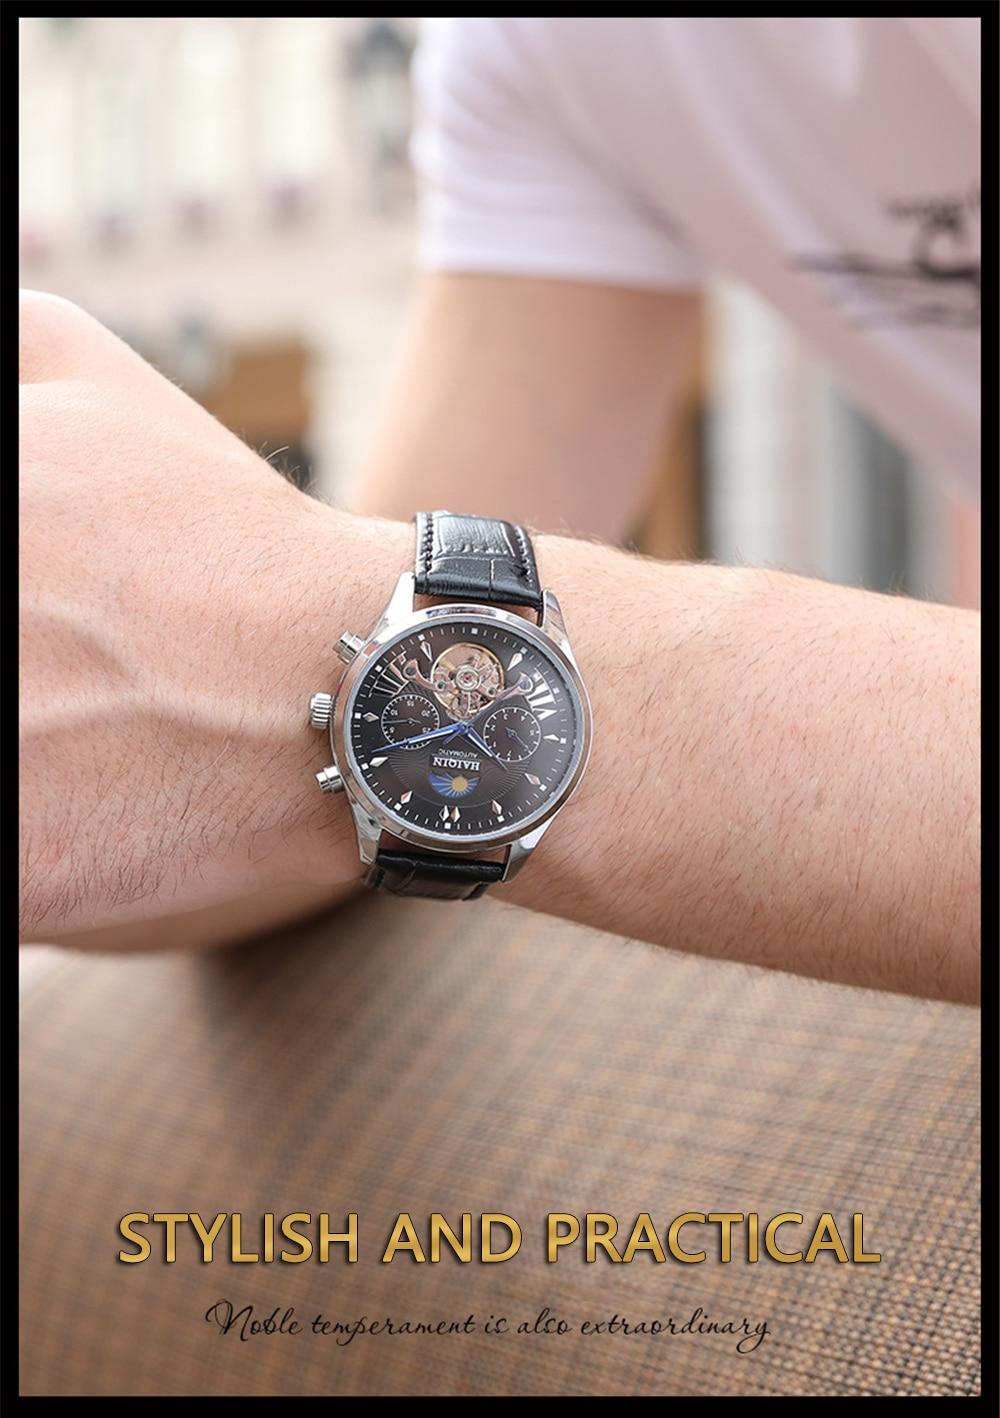 HTB1uIODXOLrK1Rjy1zdq6ynnpXaM HAIQIN luxury Automatic Mechanical Men Watch classic Business Watch men Tourbillon Waterproof Male Wristwatch Relogio Masculino